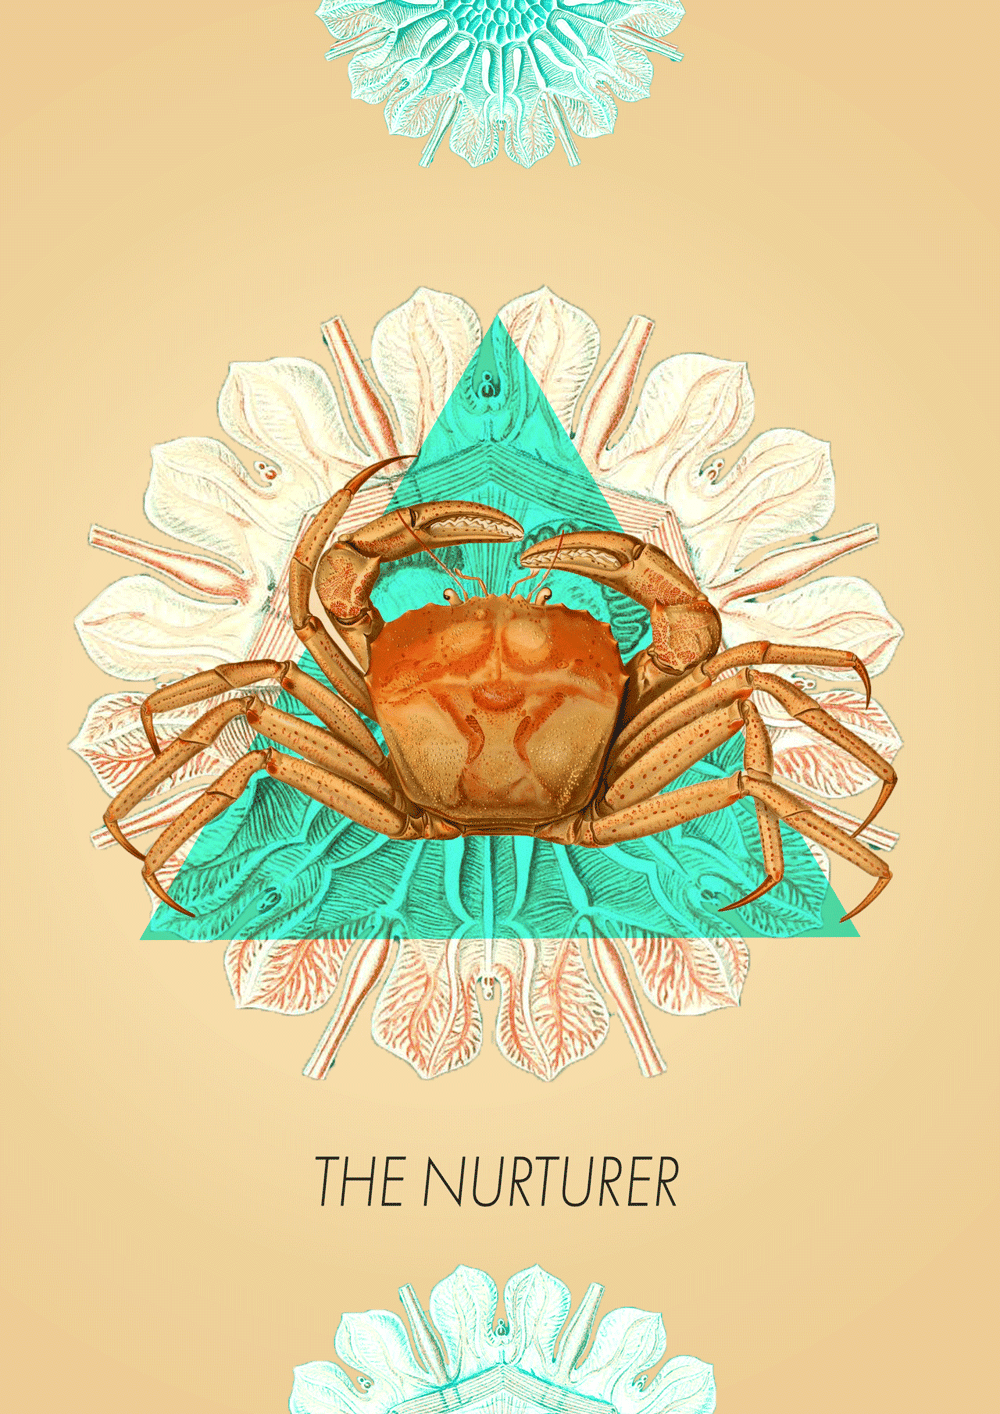 The Nurturer - image 1 - student project